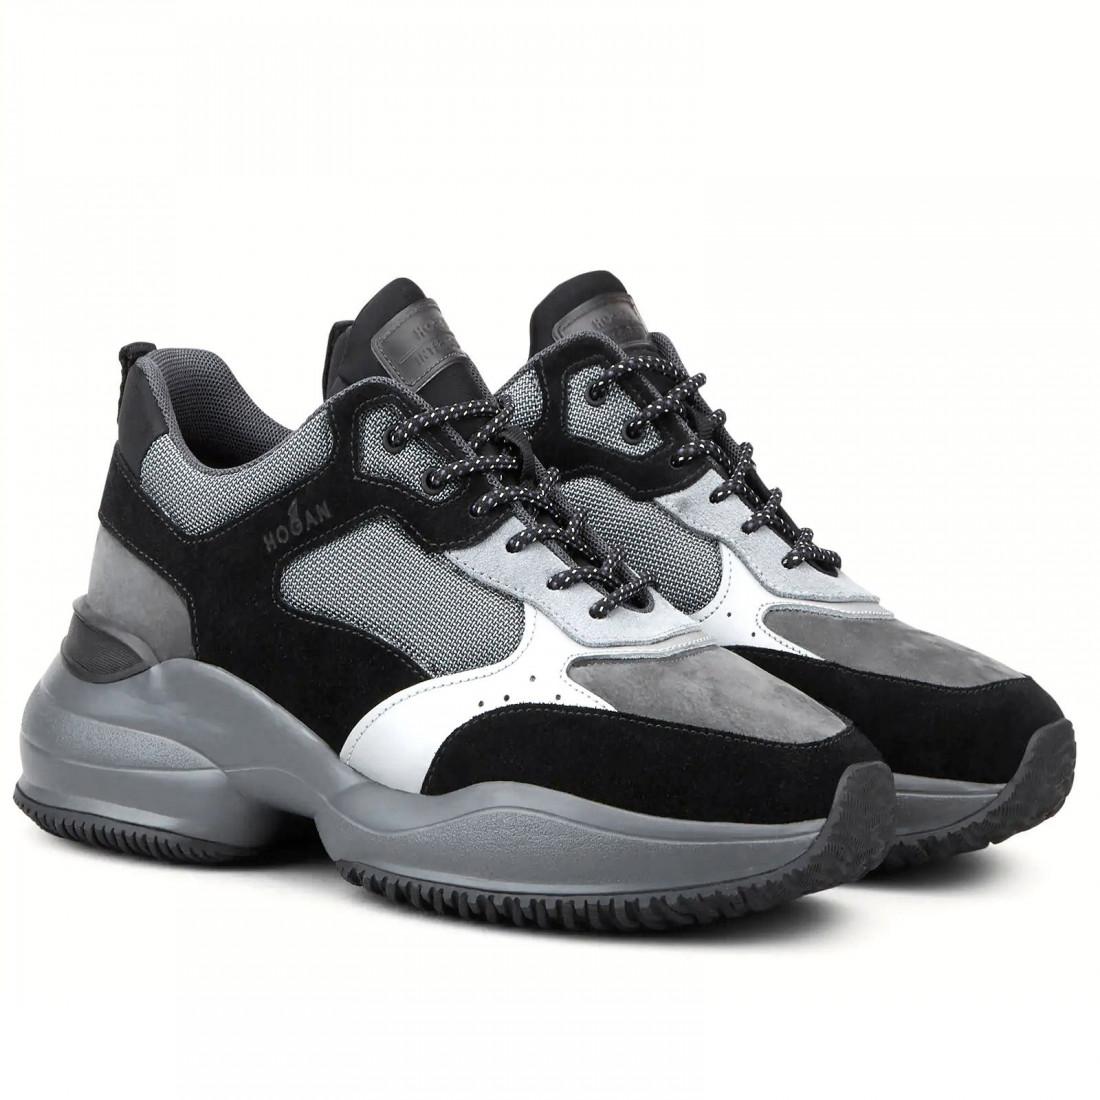 sneakers herren hogan hxm5450dh10osx837z 7682